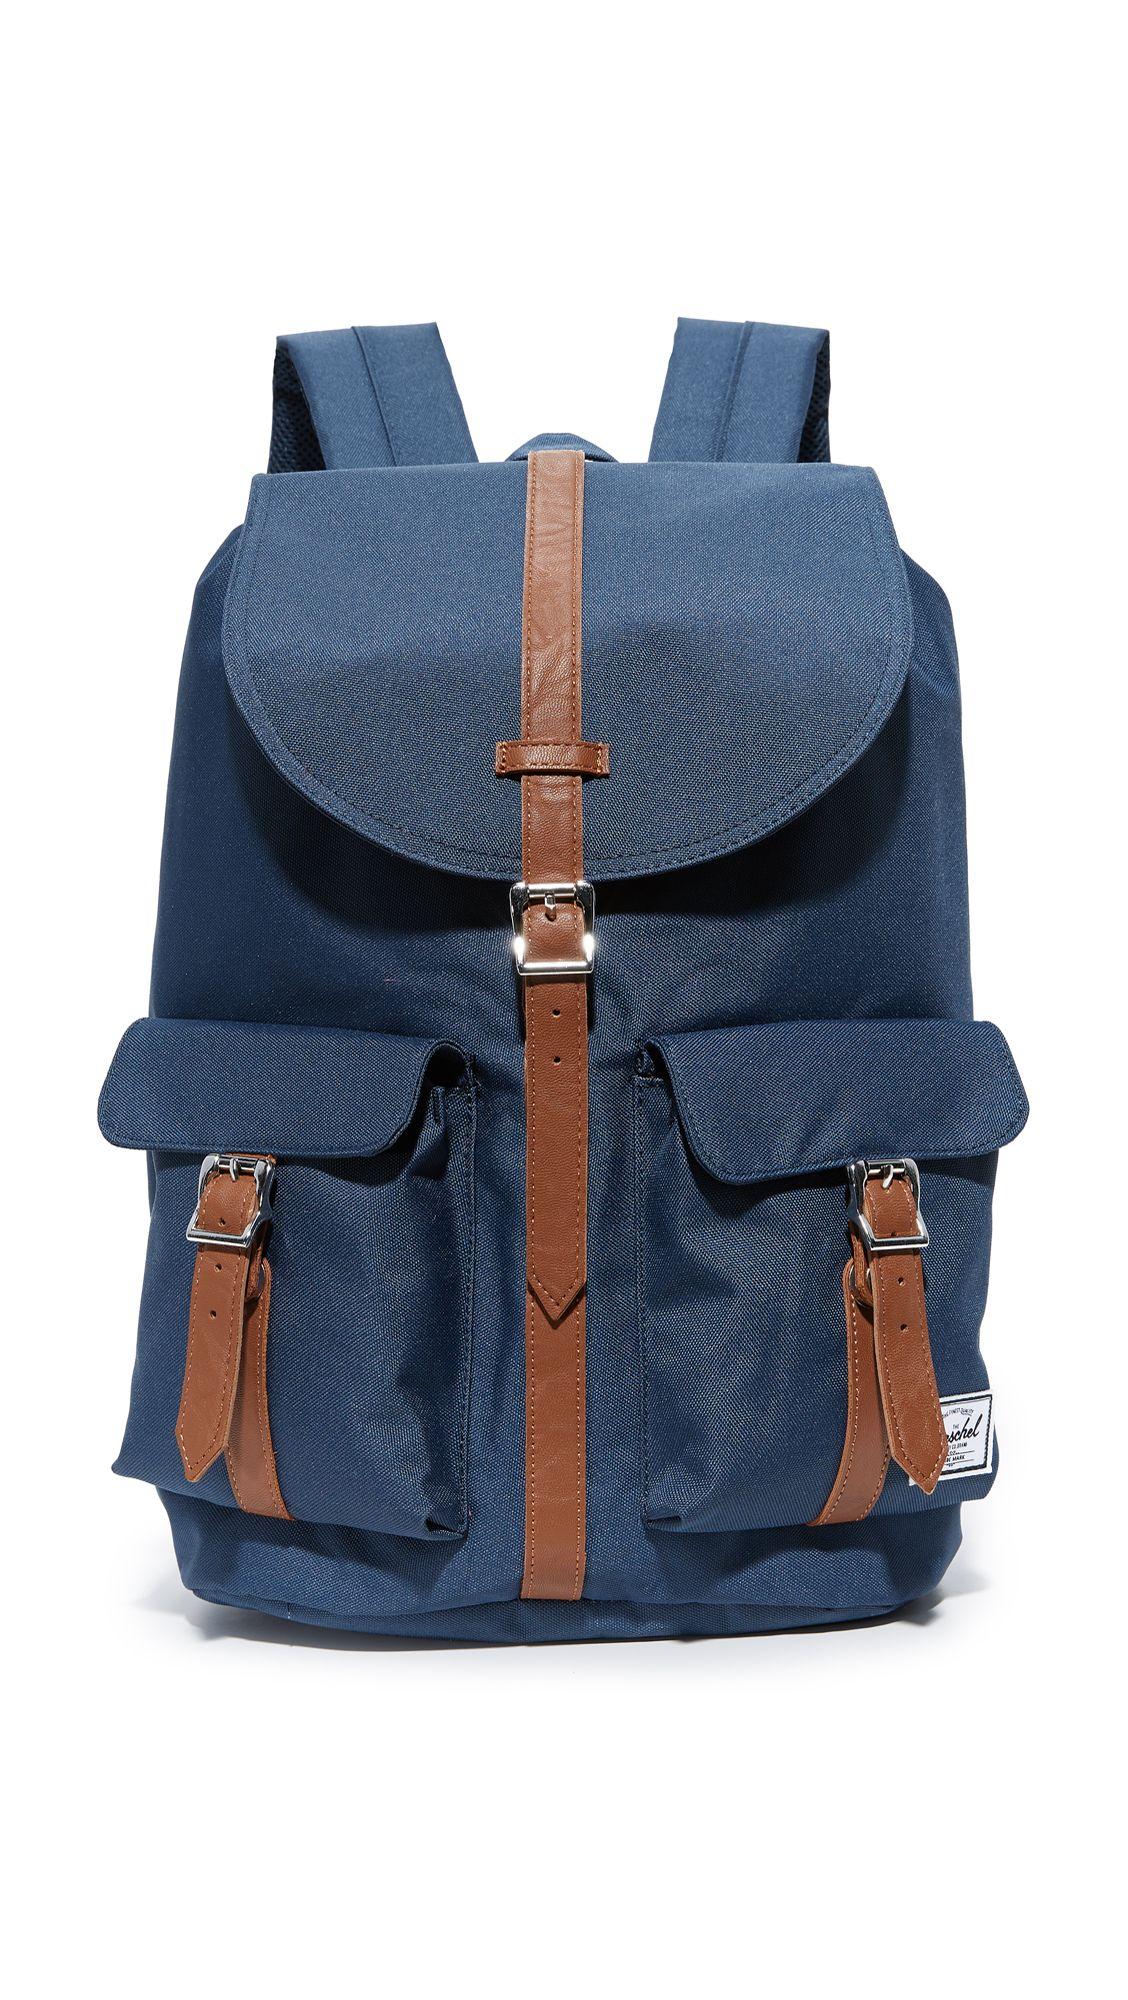 60b15098ba22 HERSCHEL SUPPLY CO. HERSCHEL SUPPLY CO. DAWSON BACKPACK.  herschelsupplyco.   bags  nylon  backpacks